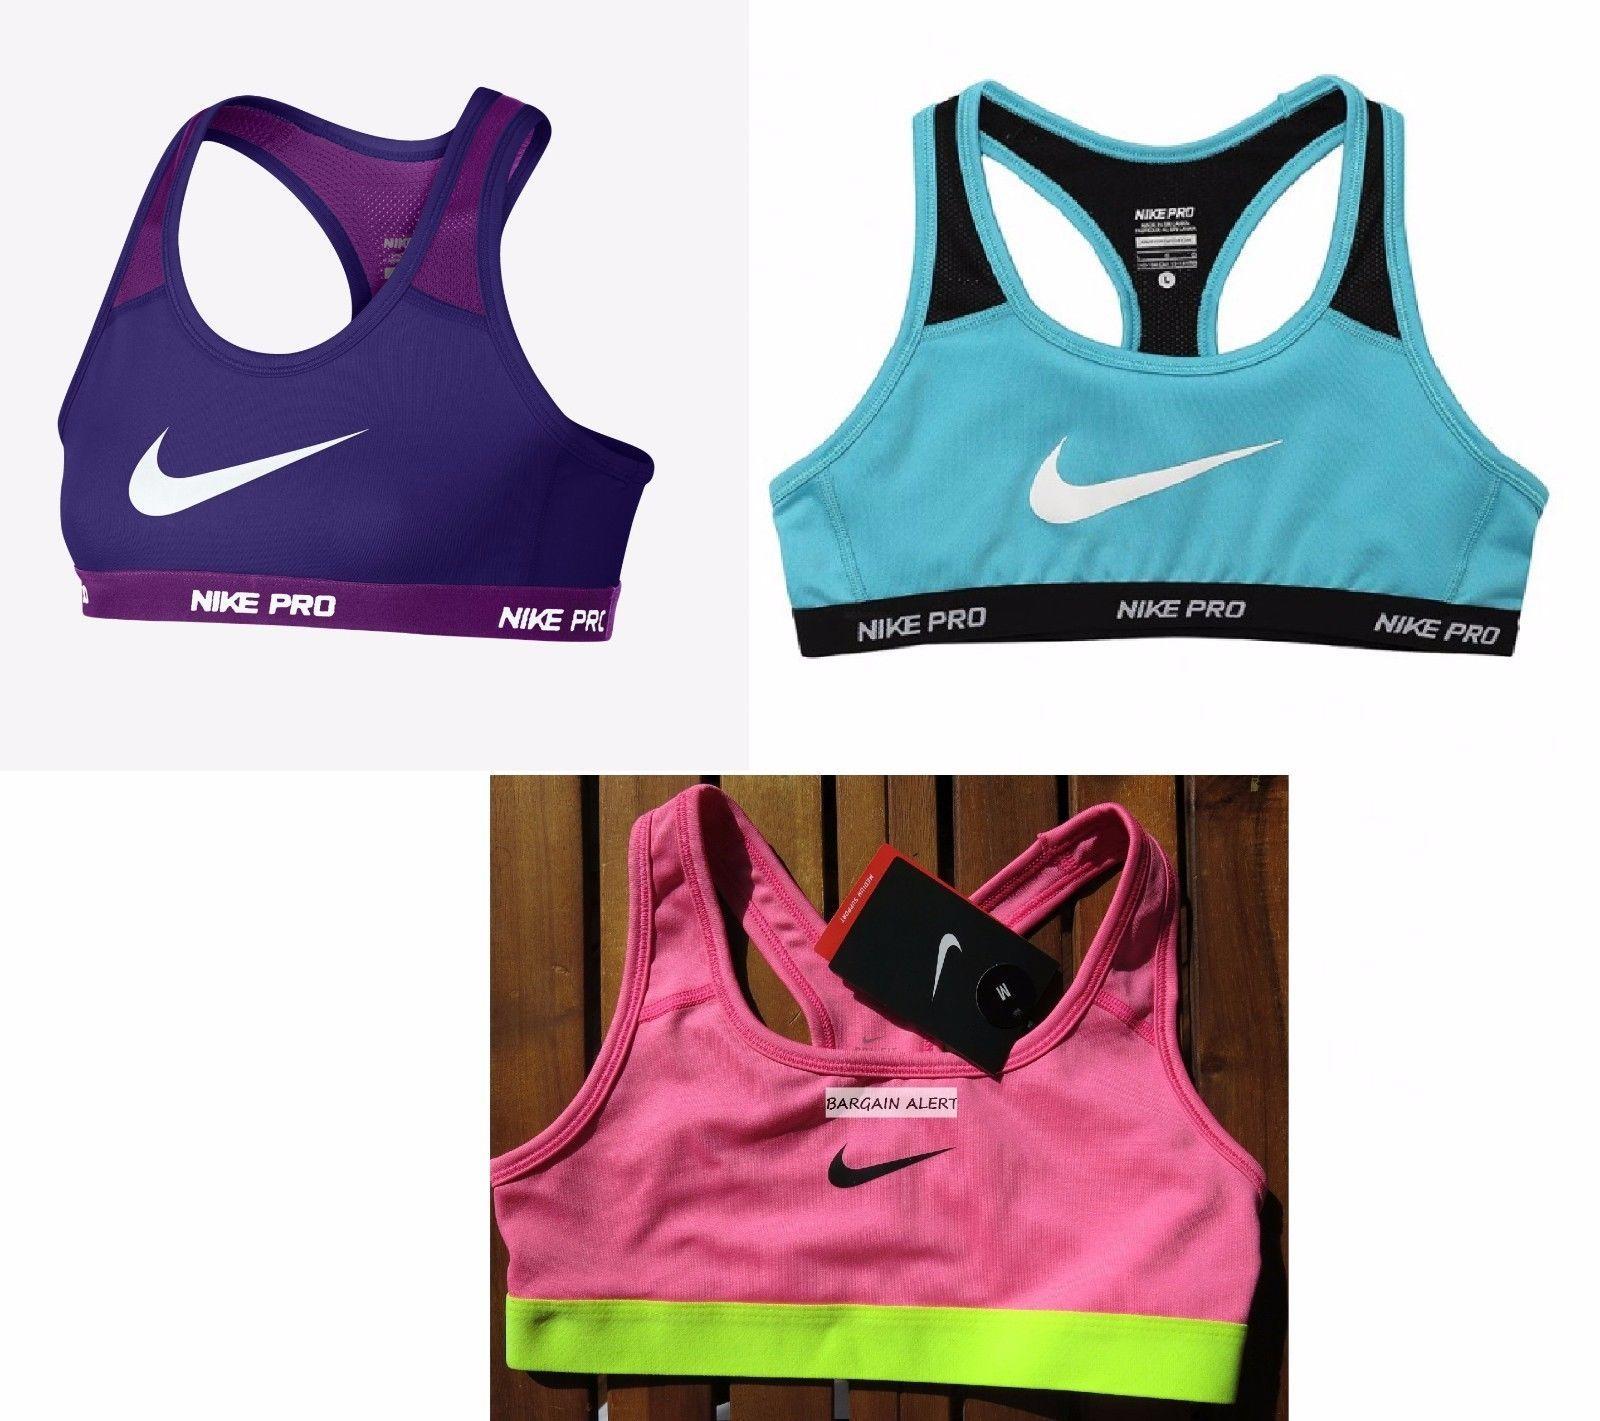 Nike Pro Girls Youth Sports Bra Medium Or 3 X Extra